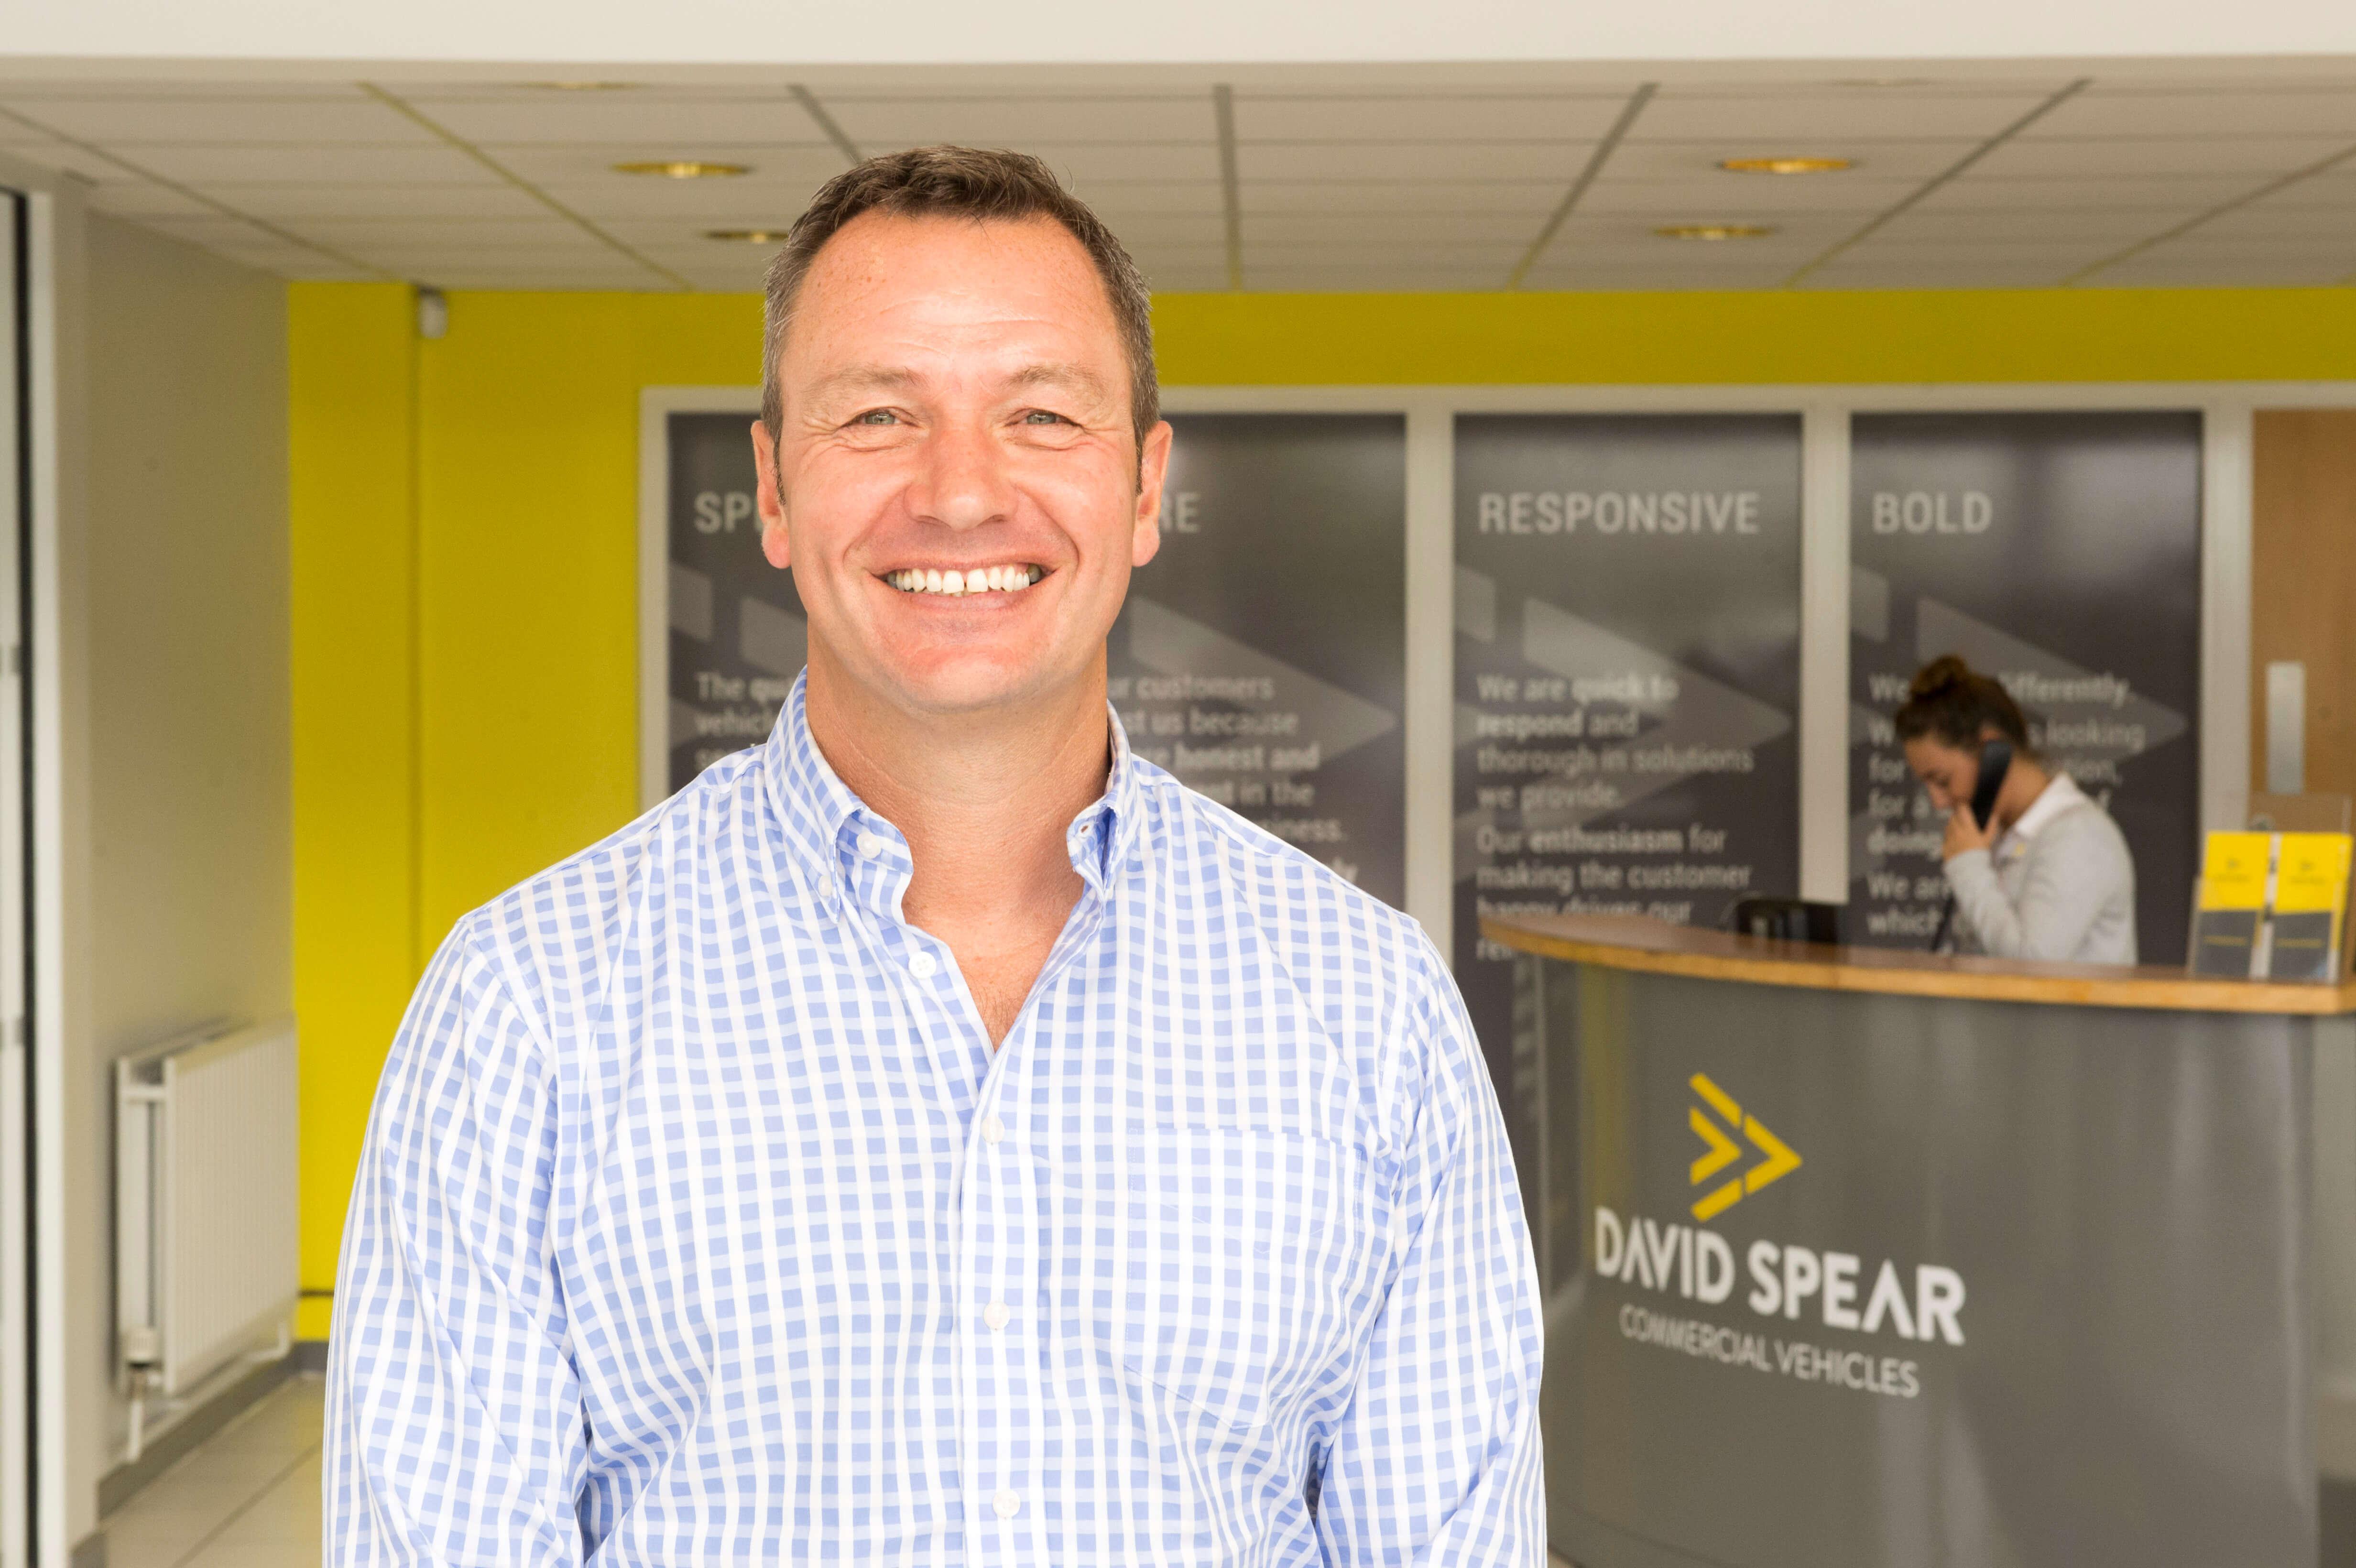 David Spear, Van Dealership South Wales UK